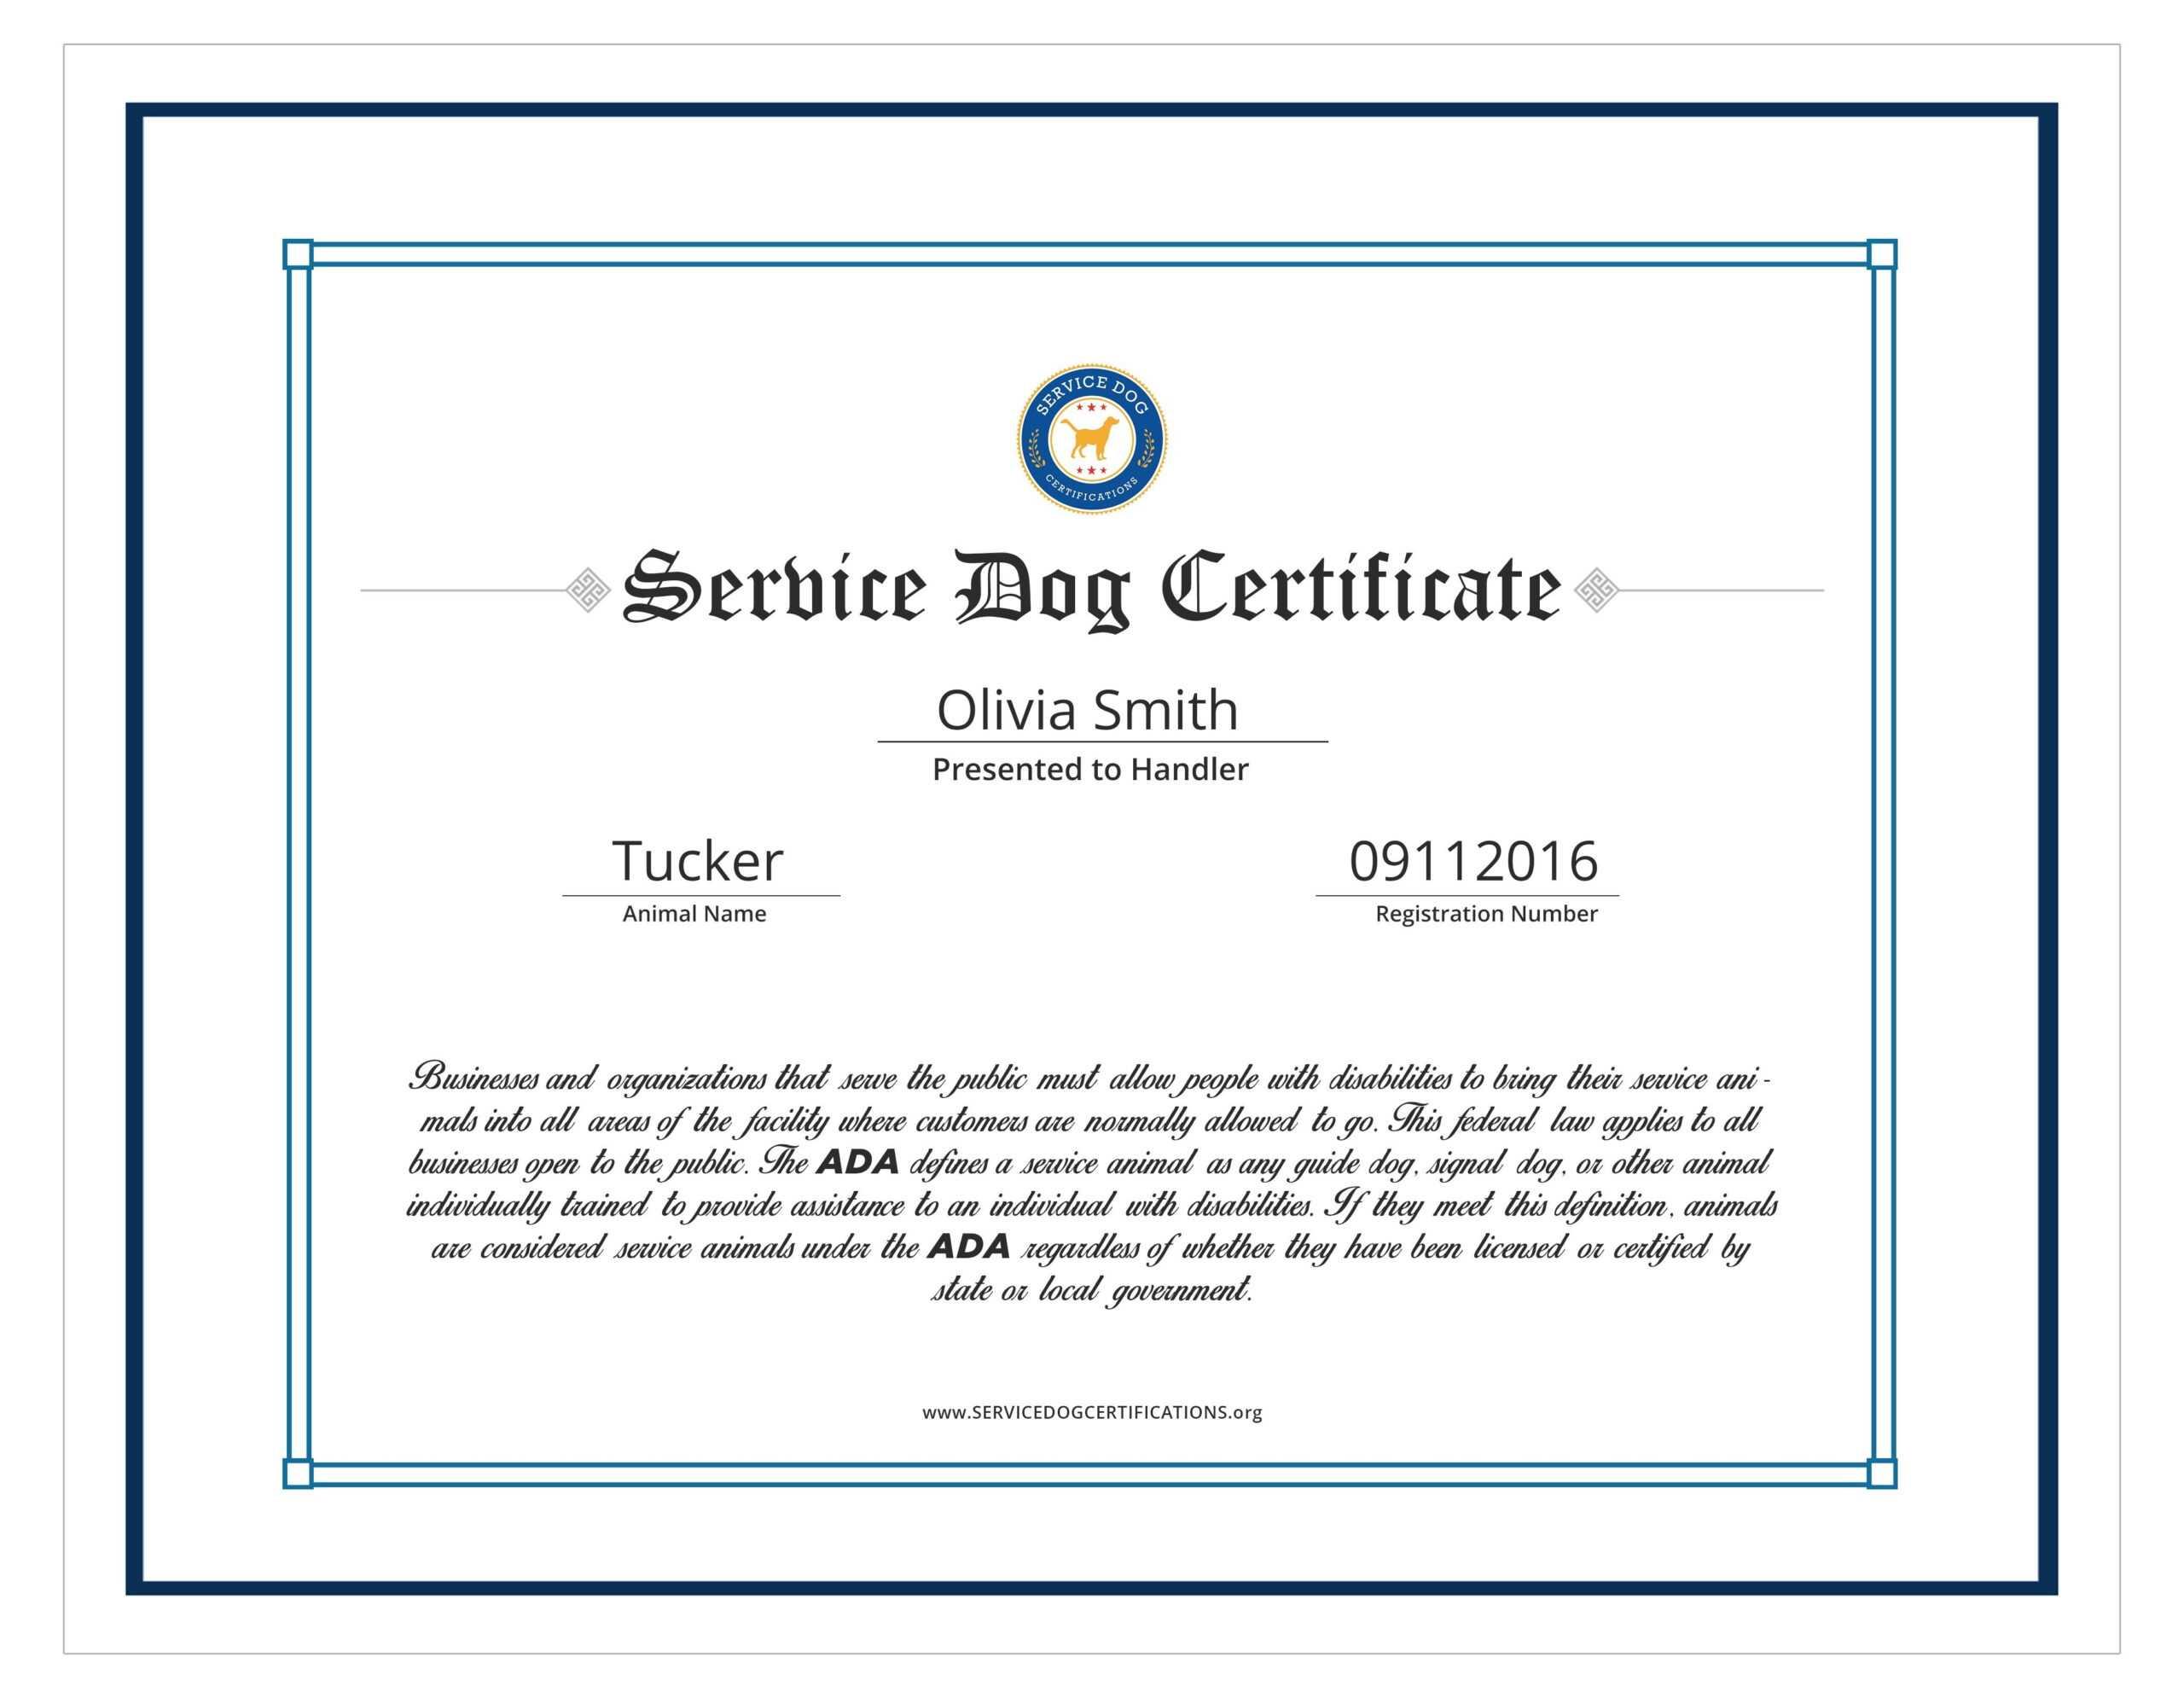 Service Animal Certificate Template - Carlynstudio Pertaining To Service Dog Certificate Template